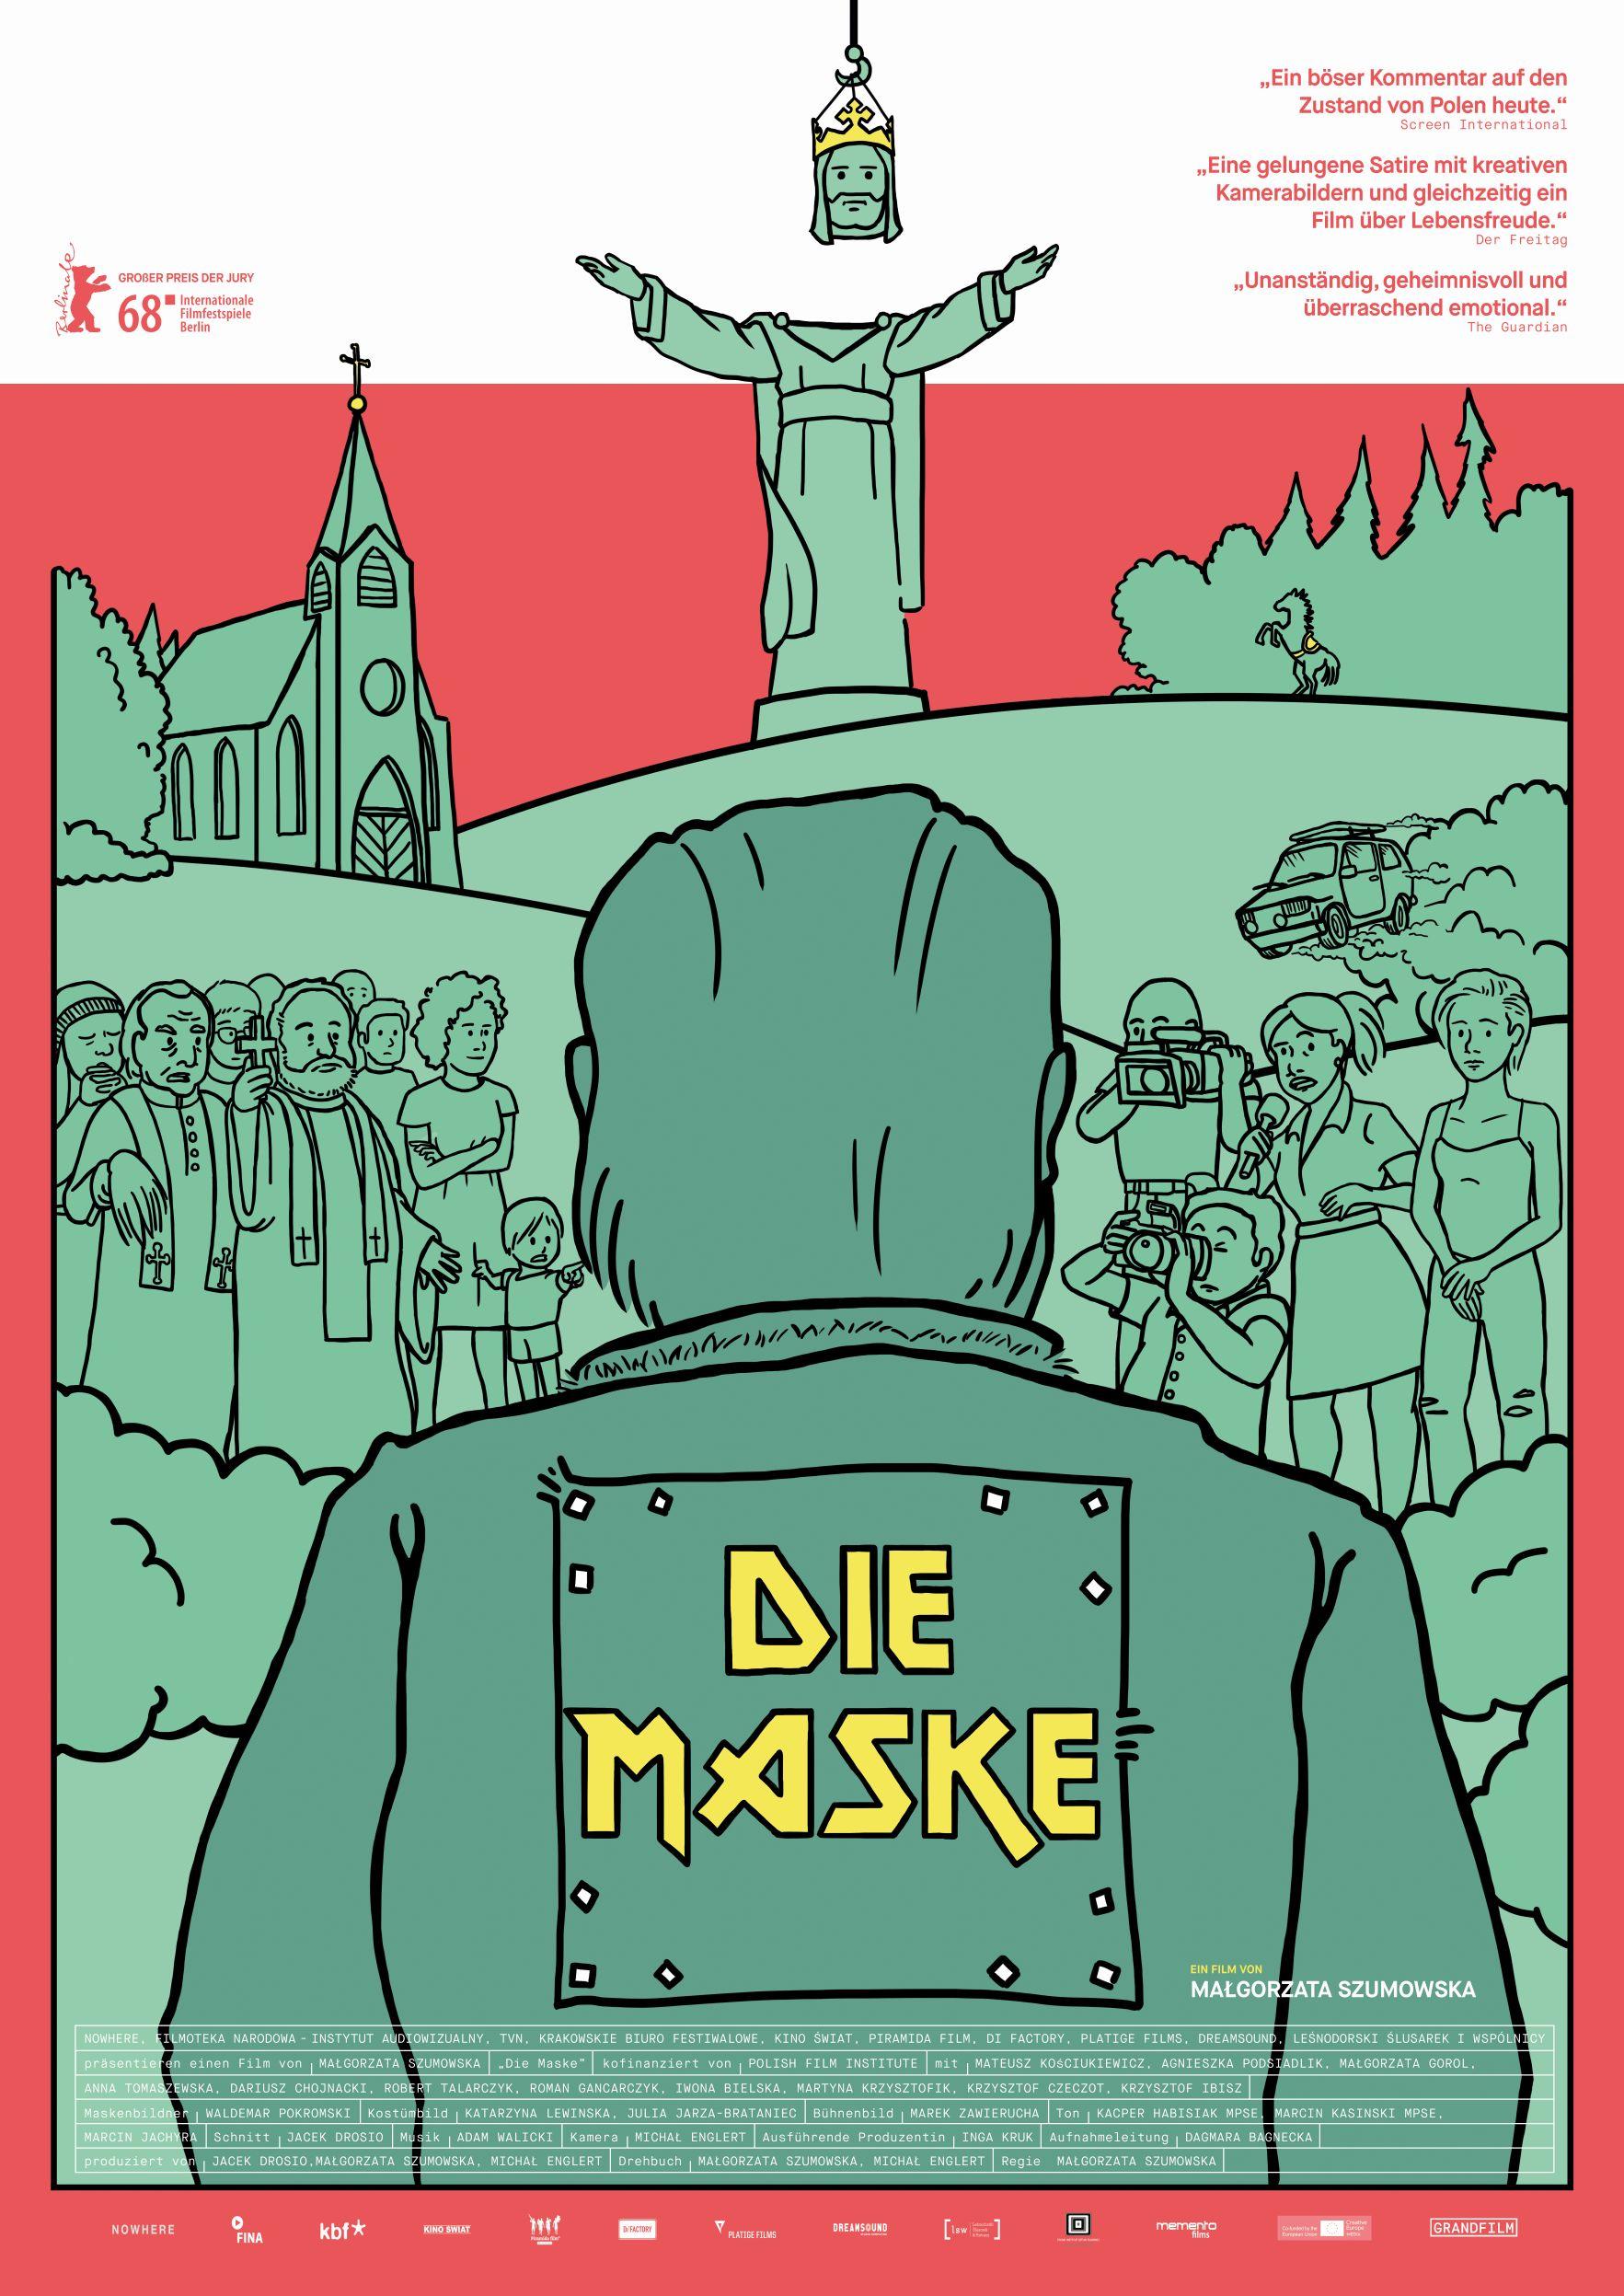 DieMaske_Plakat_2018_12_21